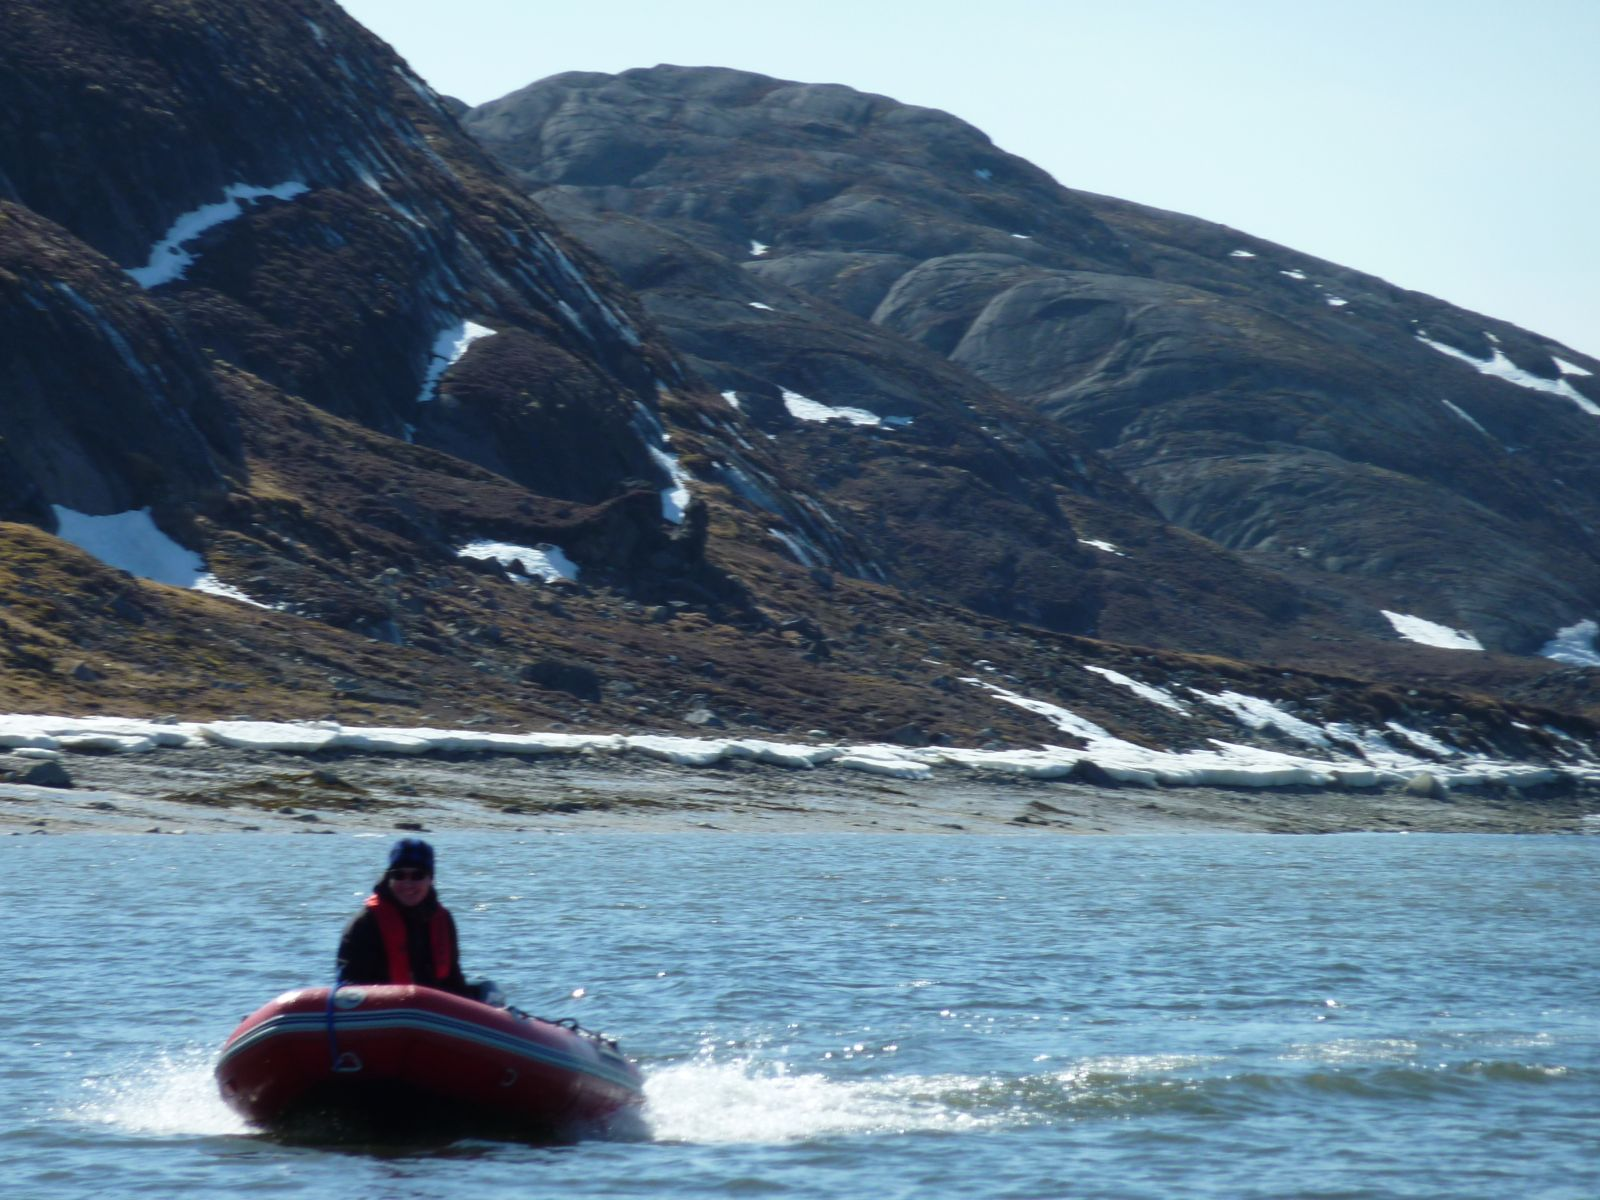 2010-05-13-1536_Jesper tager 1. tur med gummibåden alene_Gummibåd; Jesper Eugenius Labansen